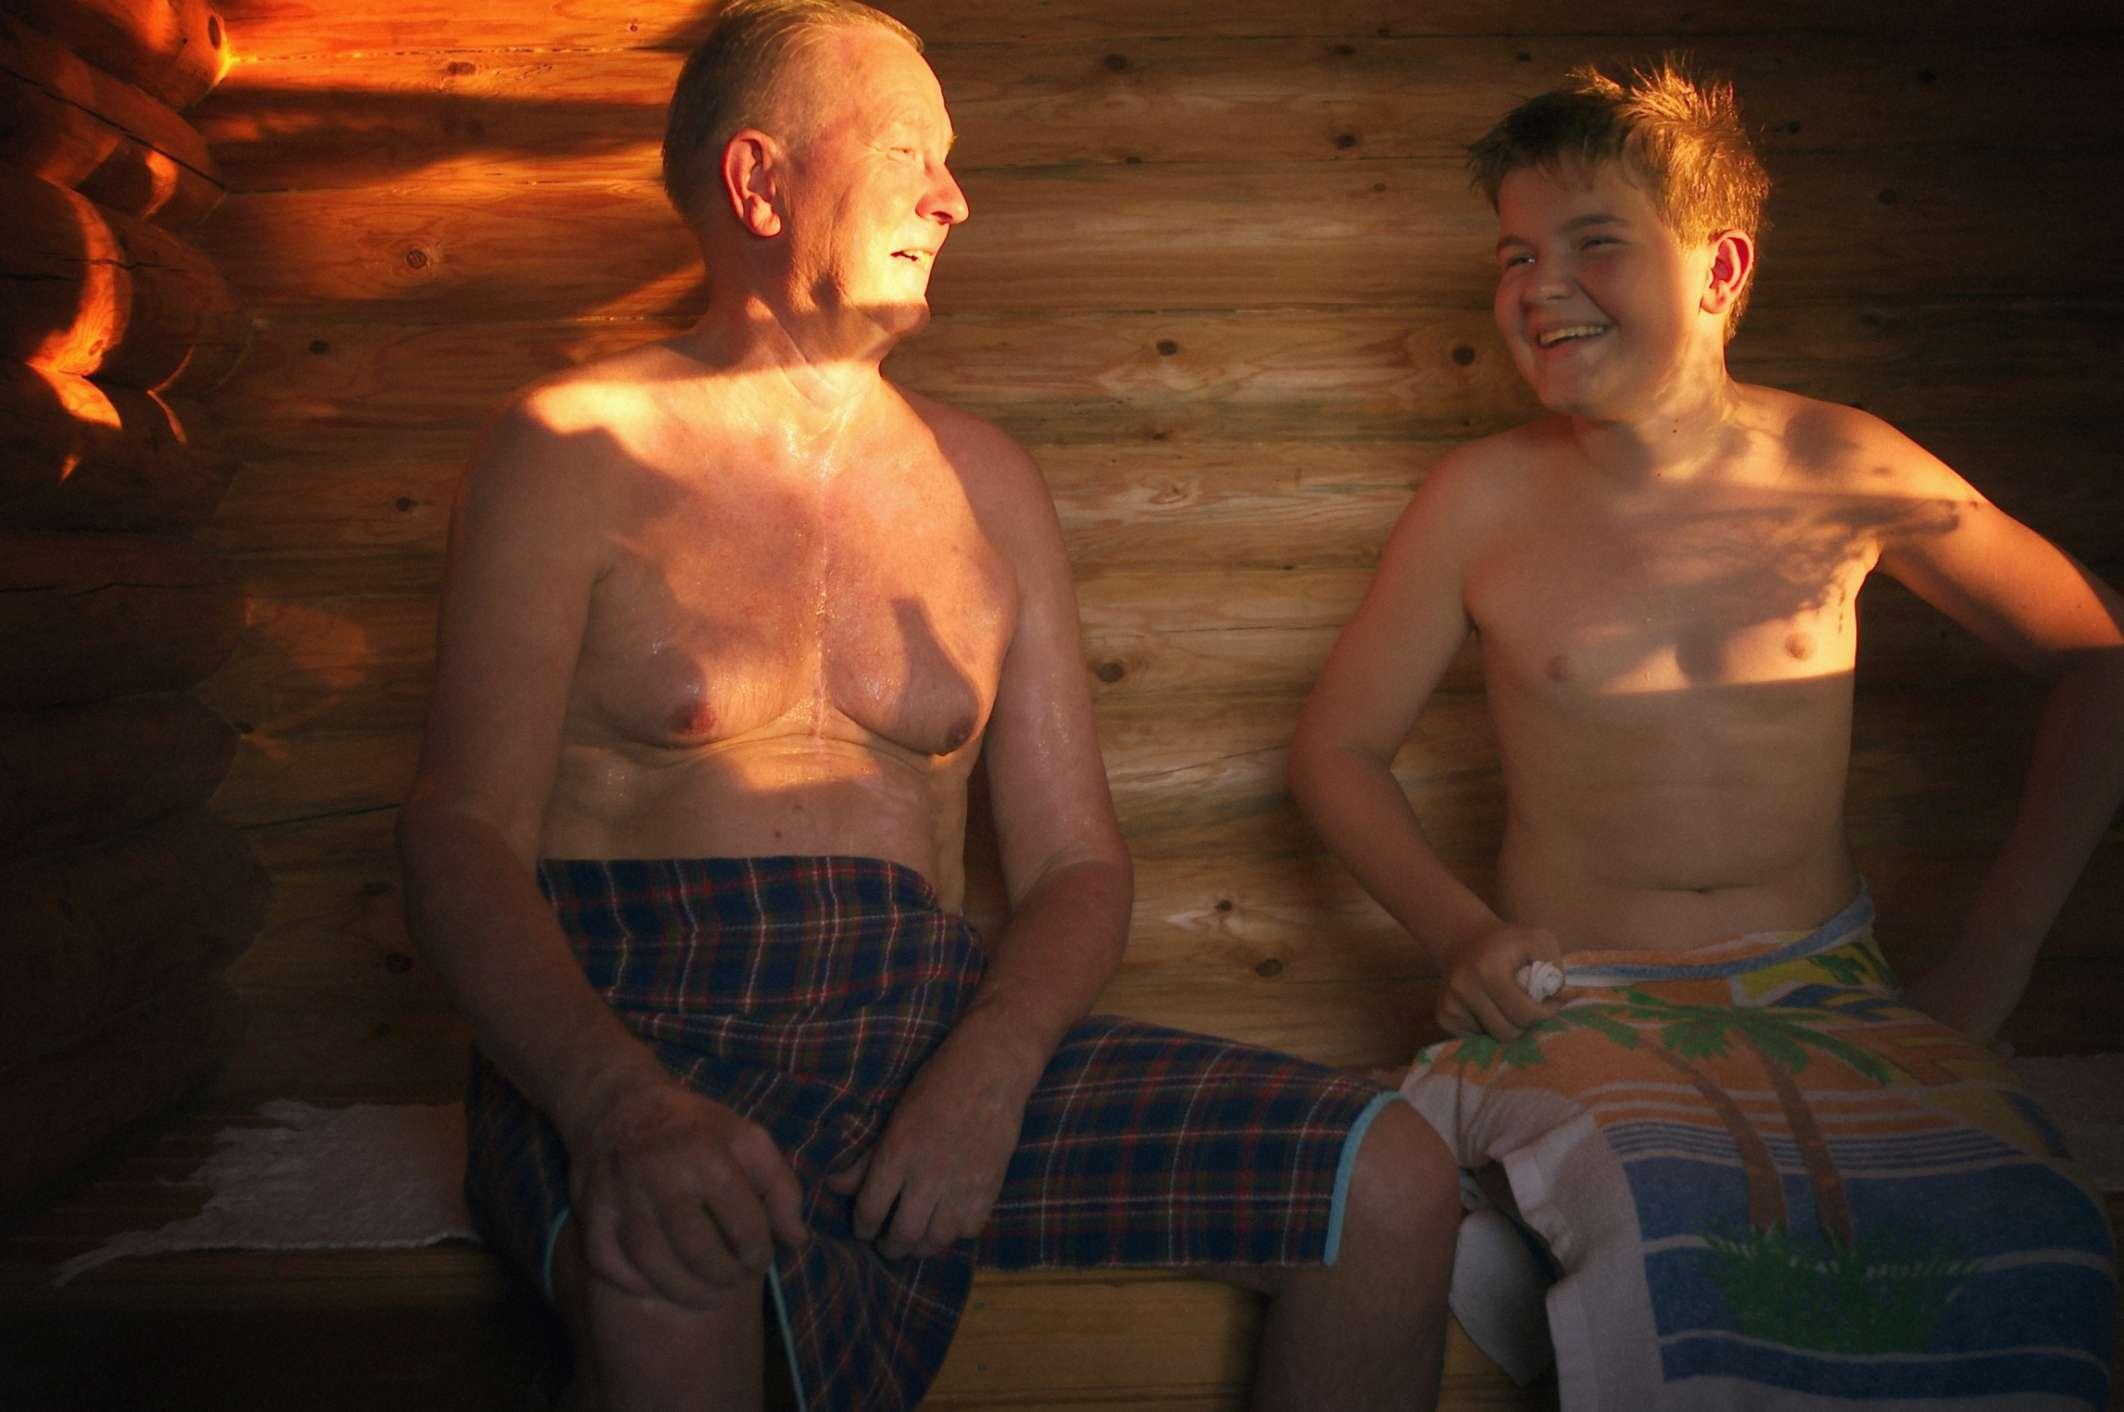 Finnish Sauna, Finland